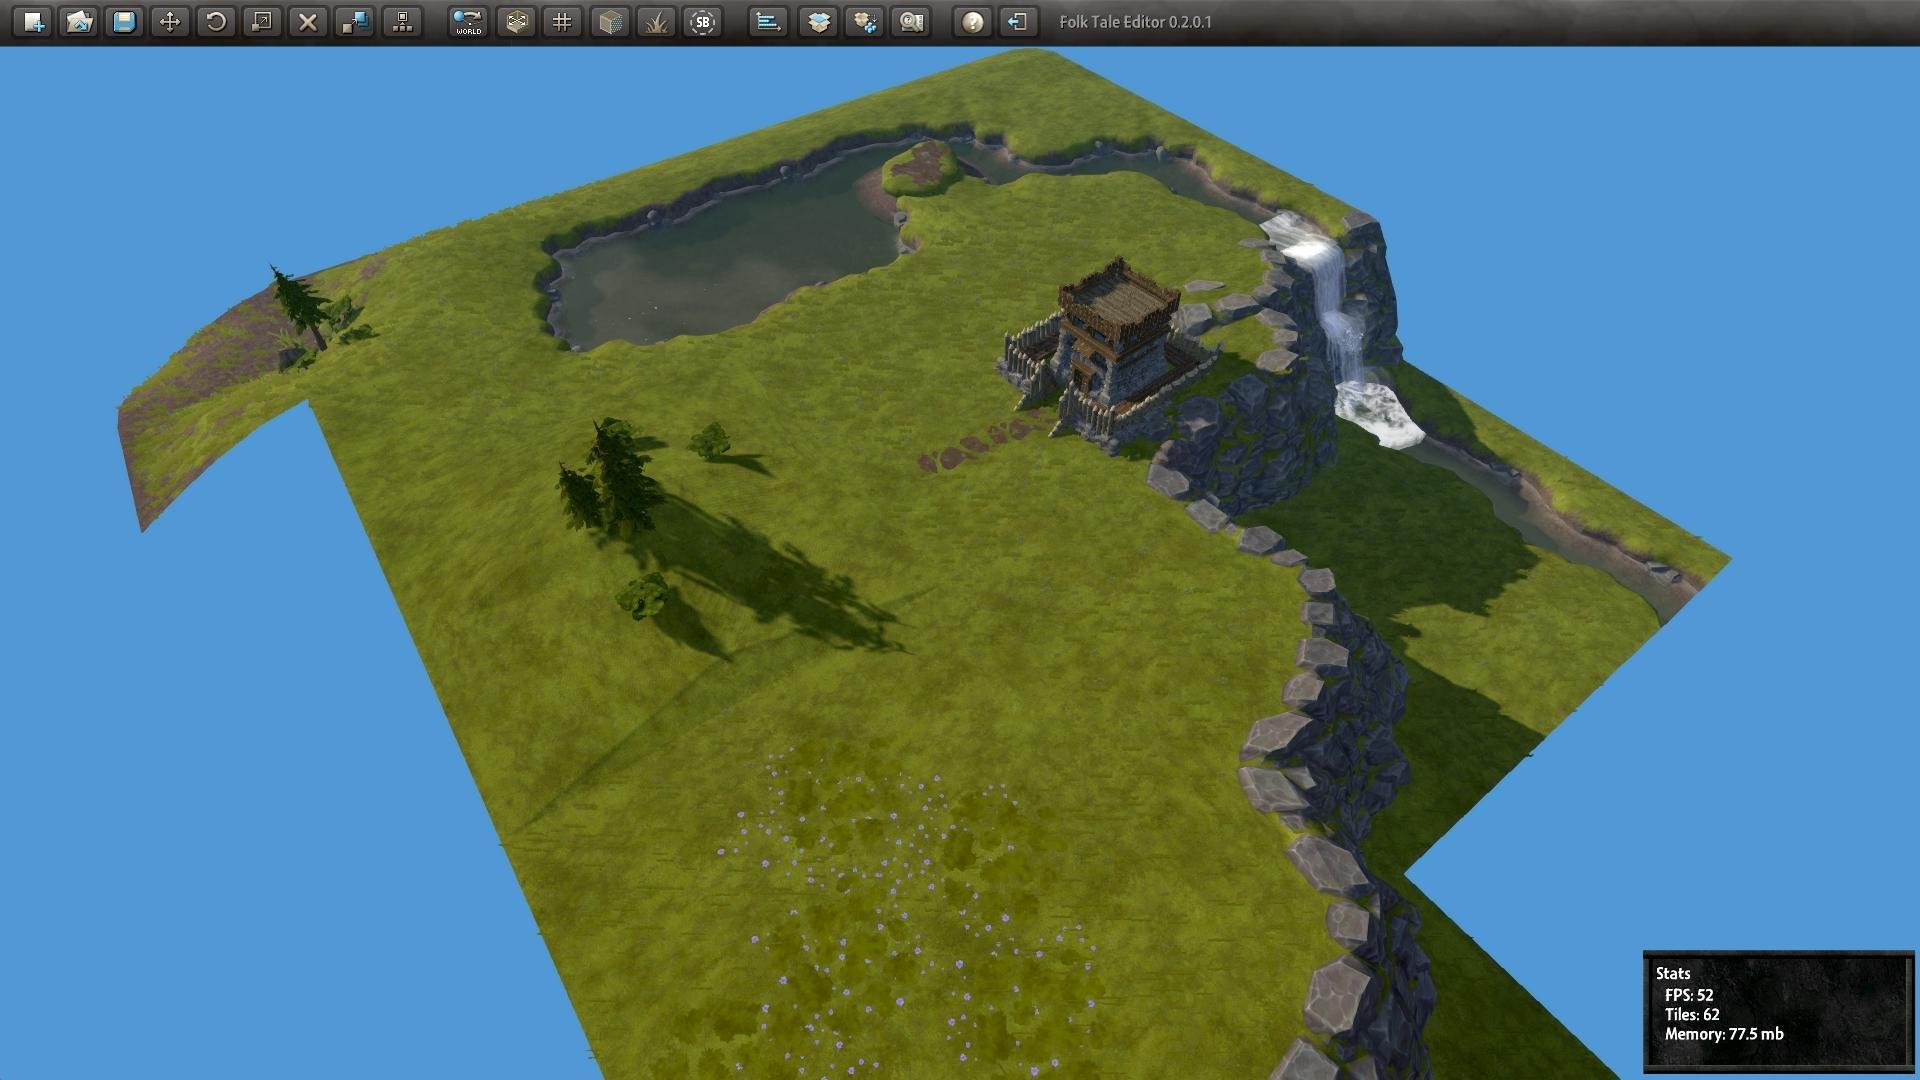 Folk Tale Location Editor Preview